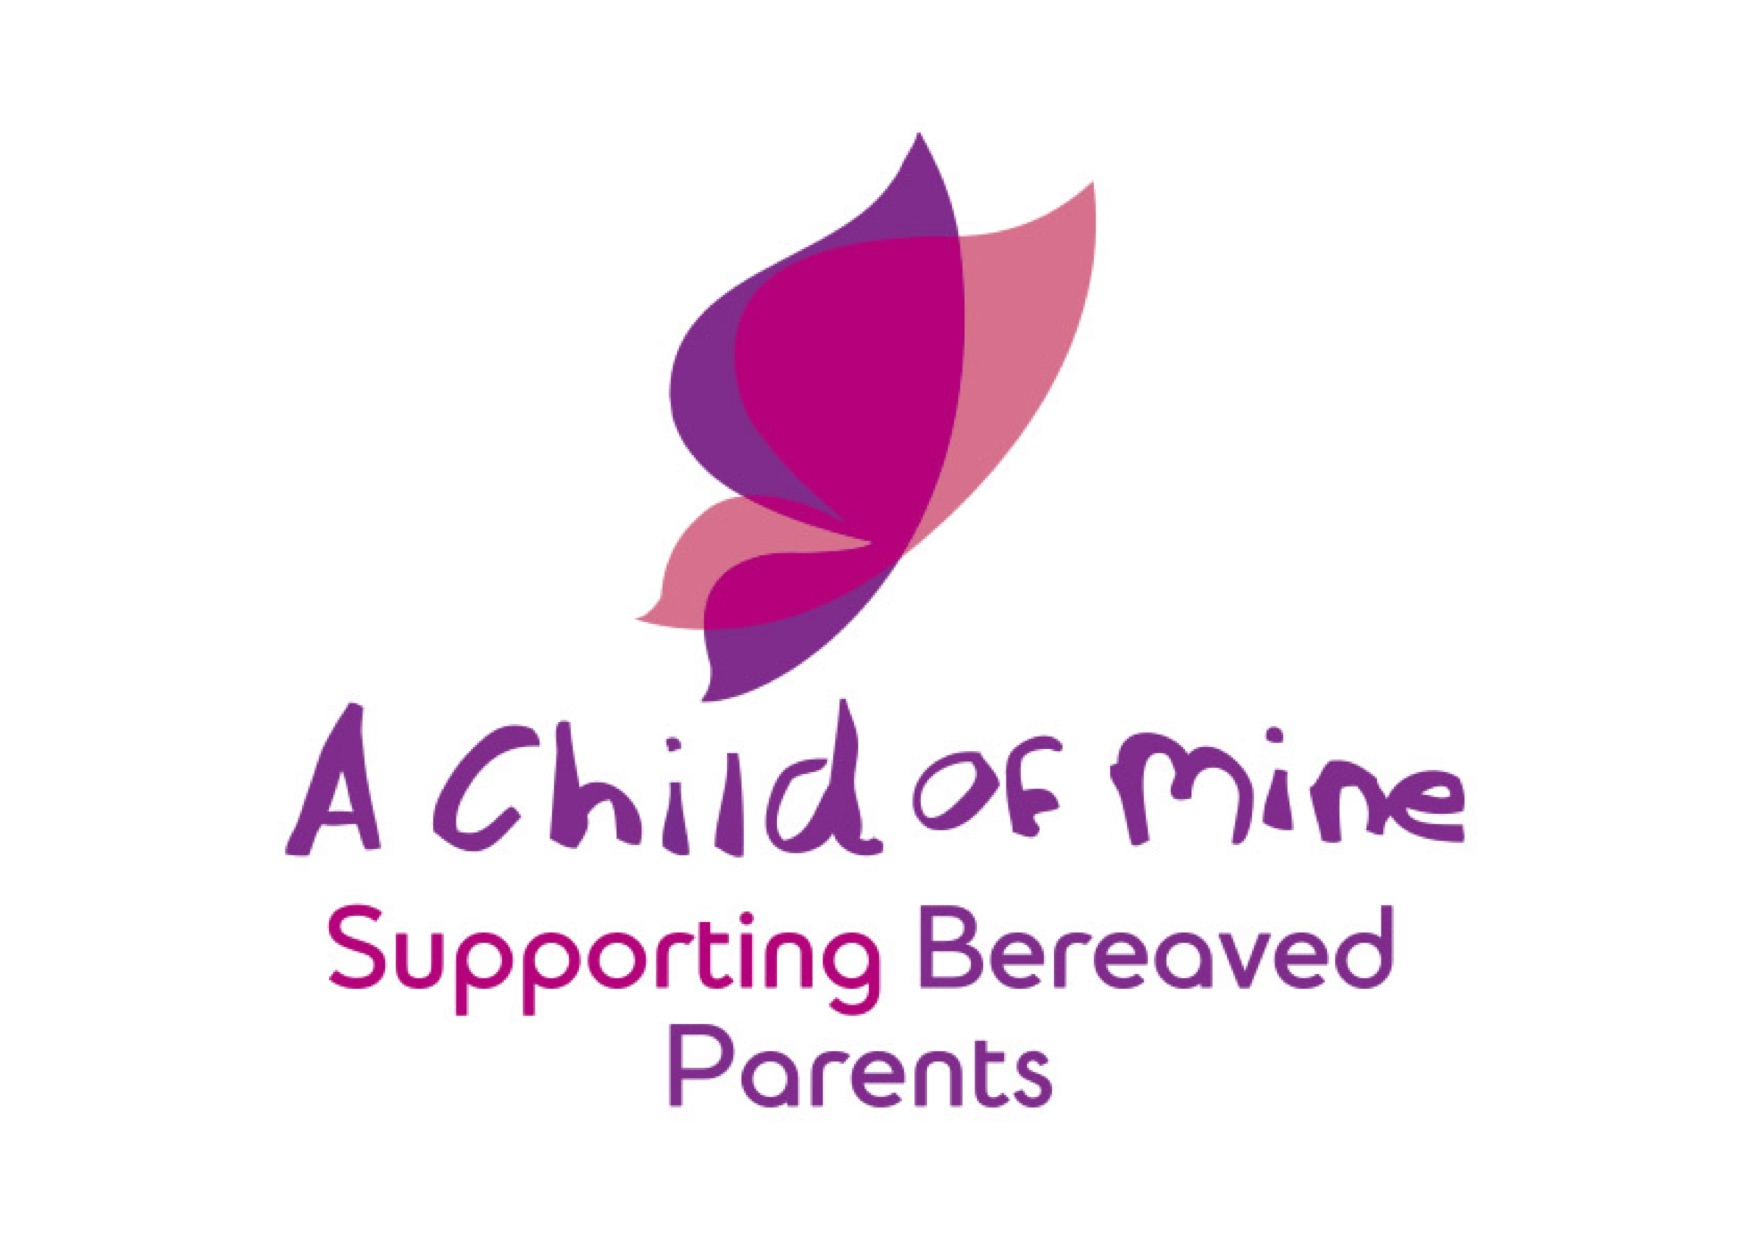 A Child of Mine